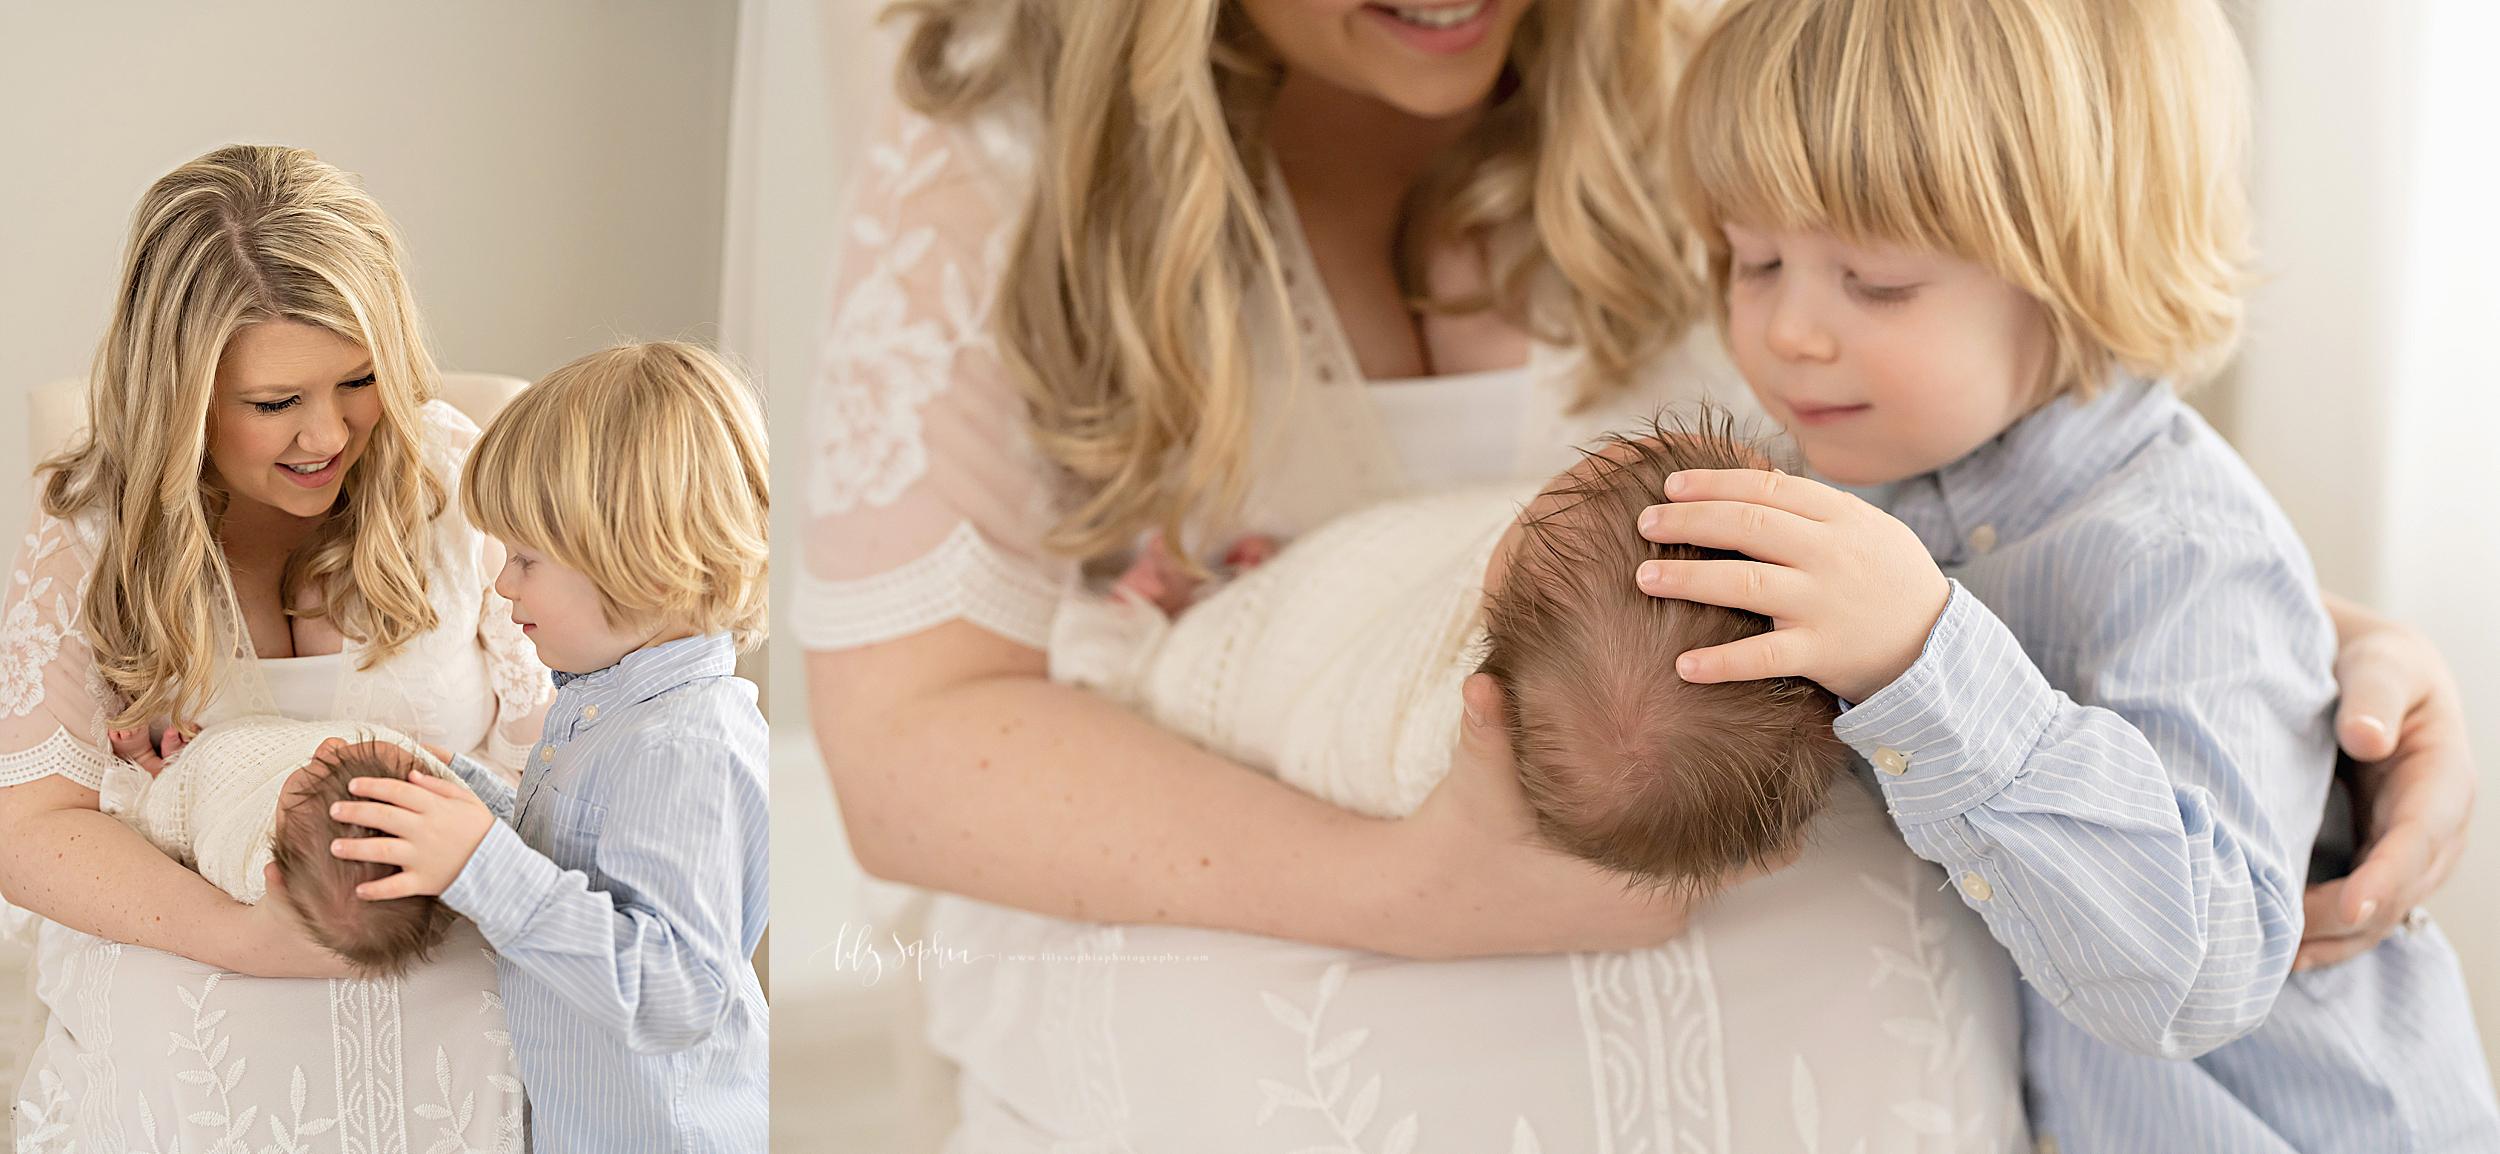 atlanta-midtown-brookhaven-ashford-dunwoody-virginia-highlands-roswell-decatur-lily-sophia-photography-newborn-baby-boy-big-brother-family-studio-session_0615.jpg